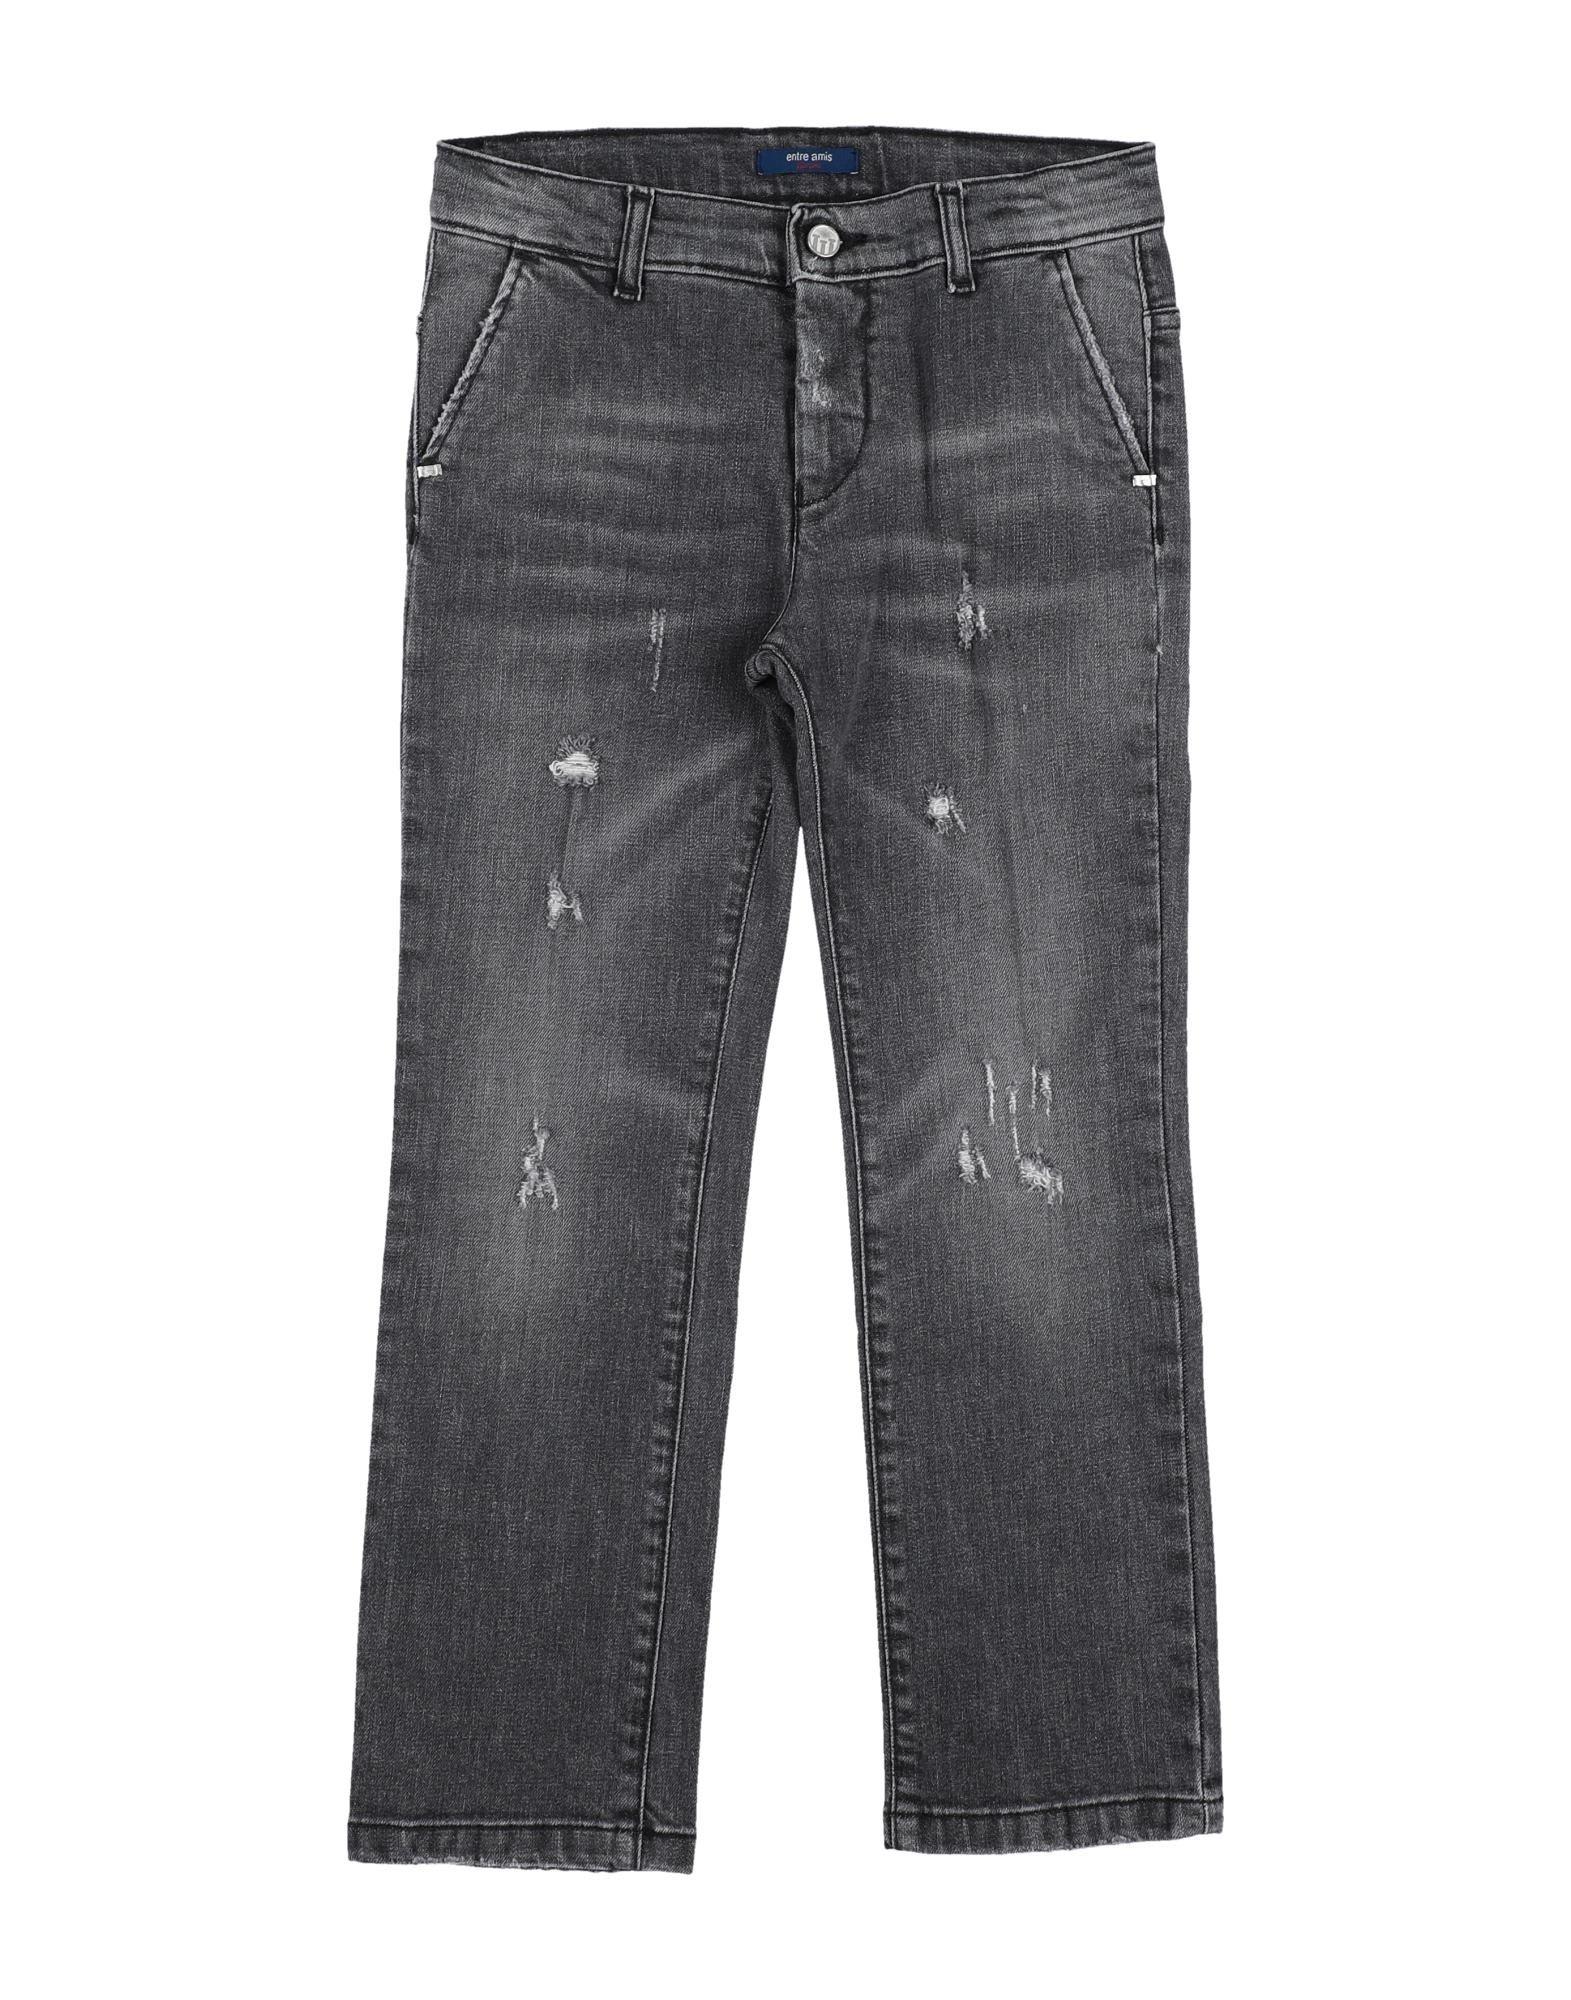 Entre Amis Garçon Kids' Jeans In Gray